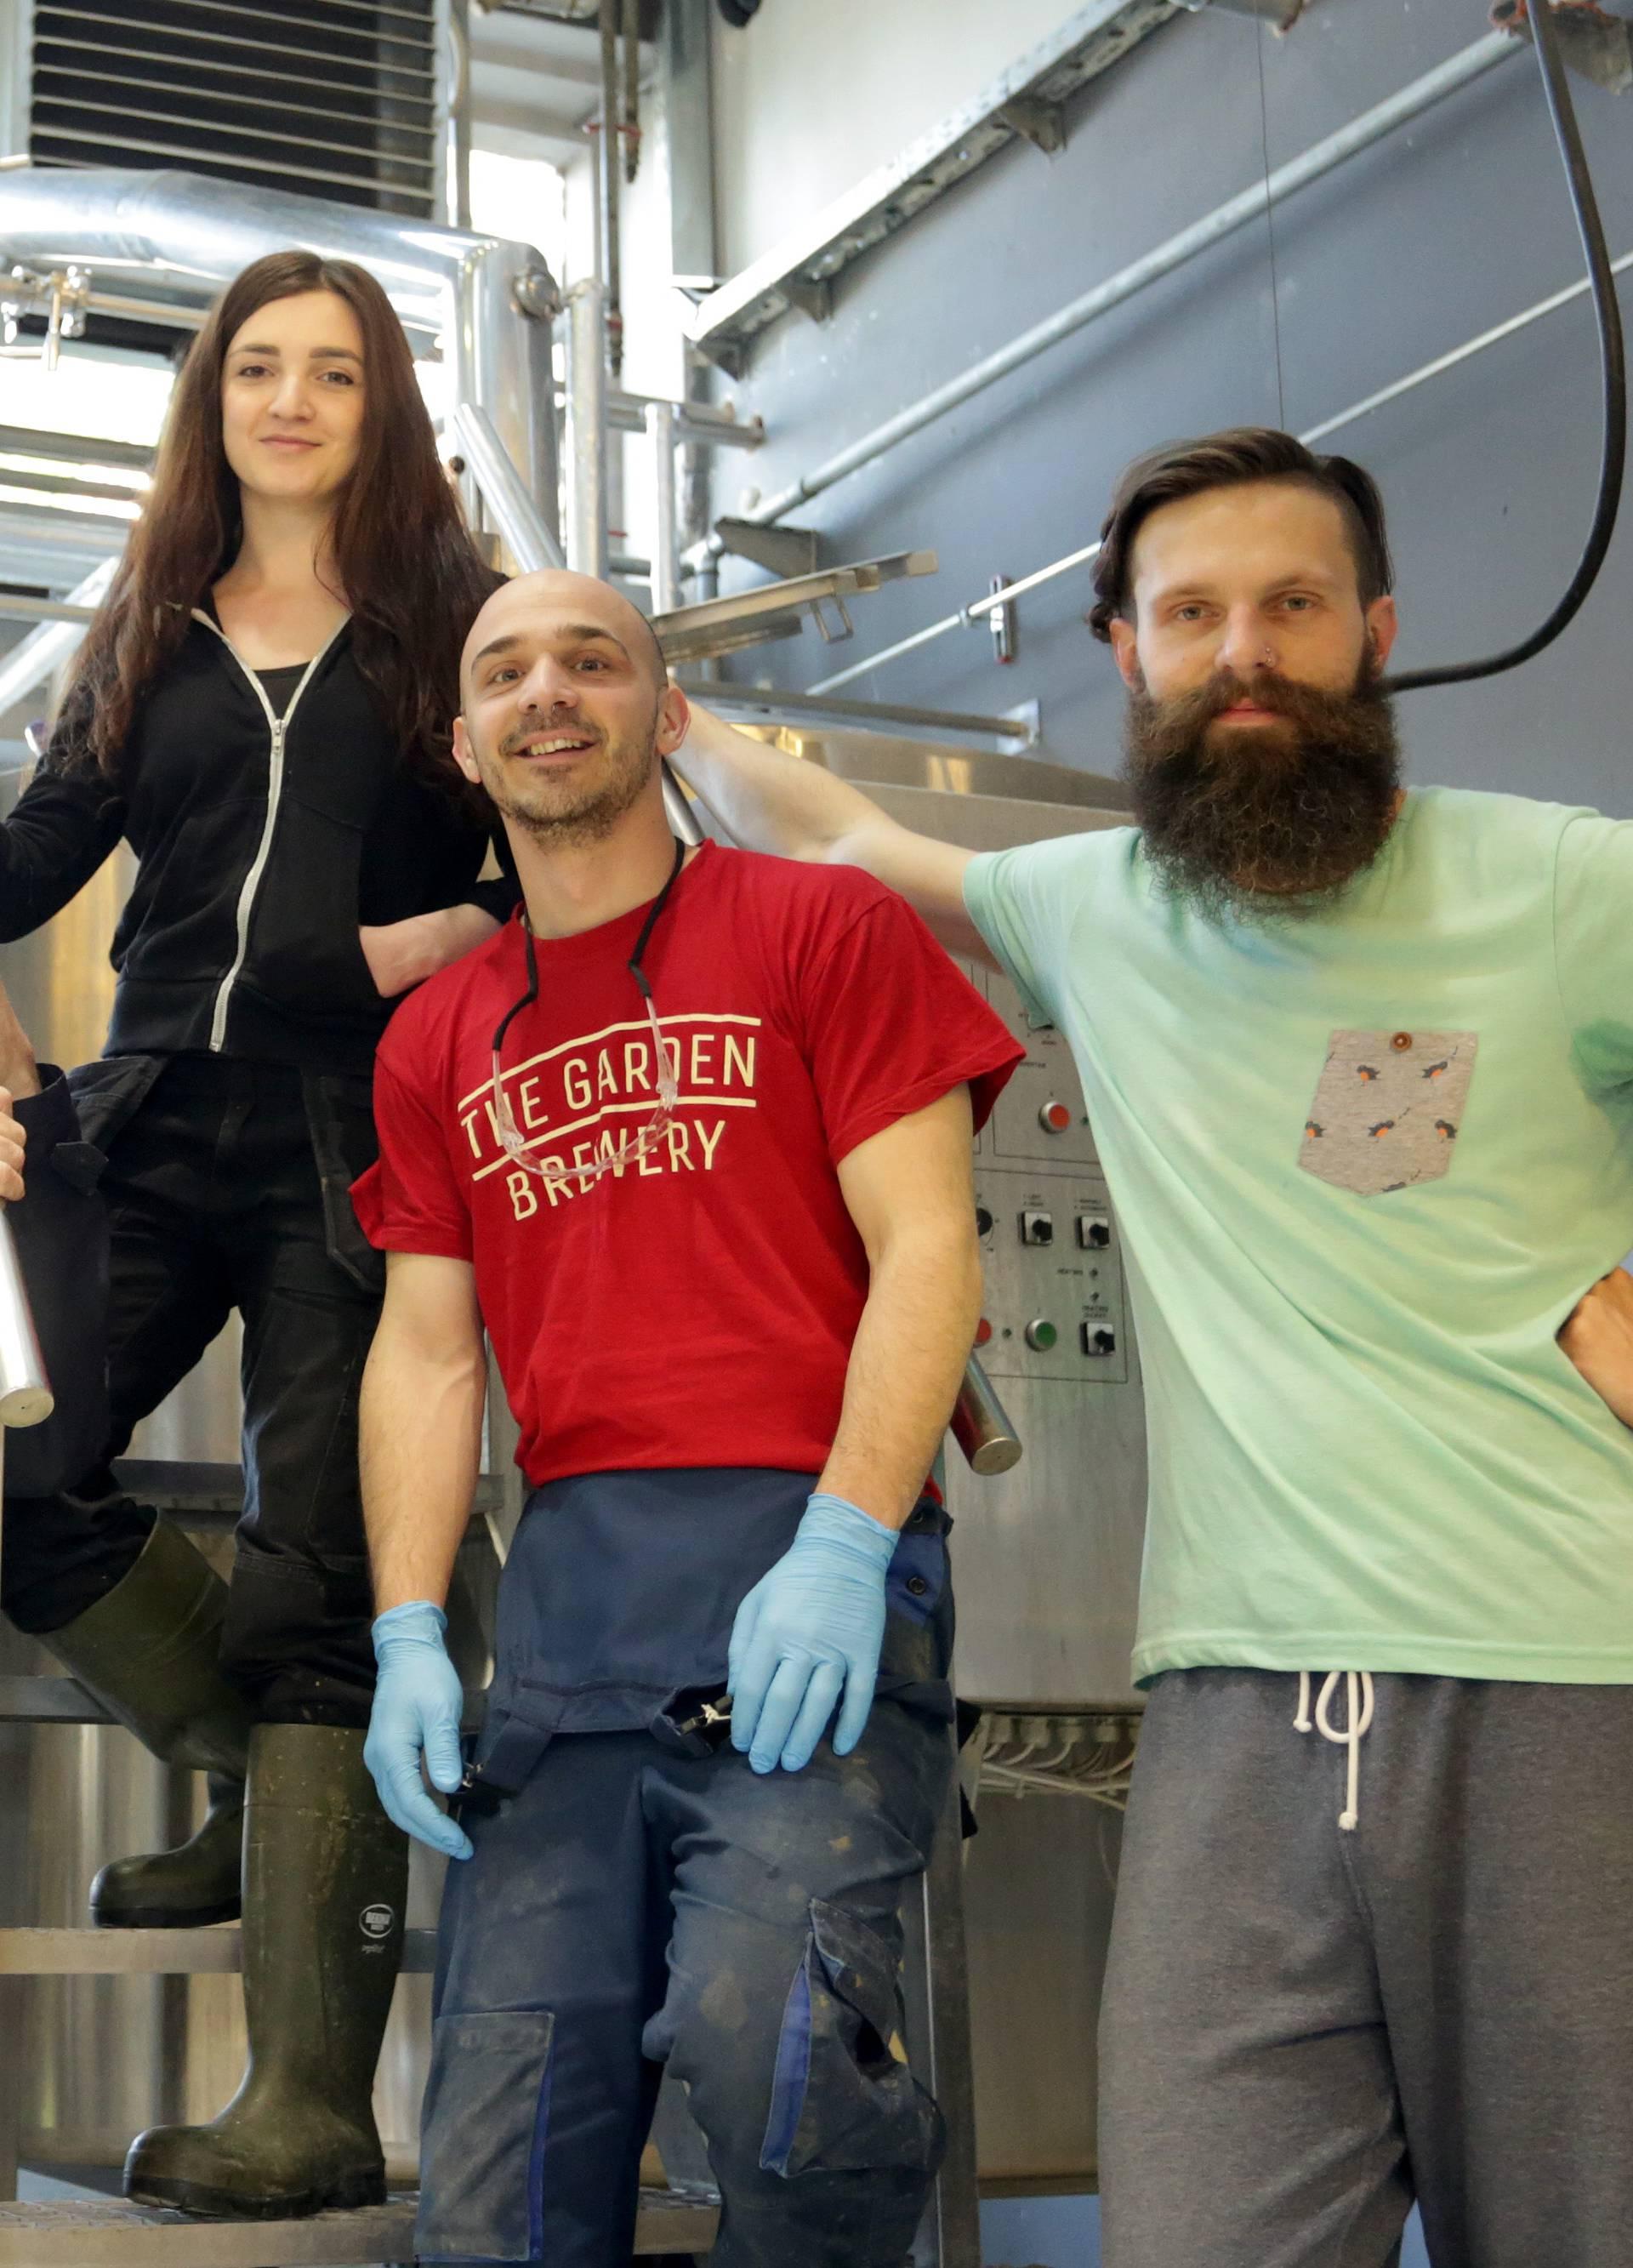 The Garden Brewery:  Istok grada u znaku ječma i hmelja